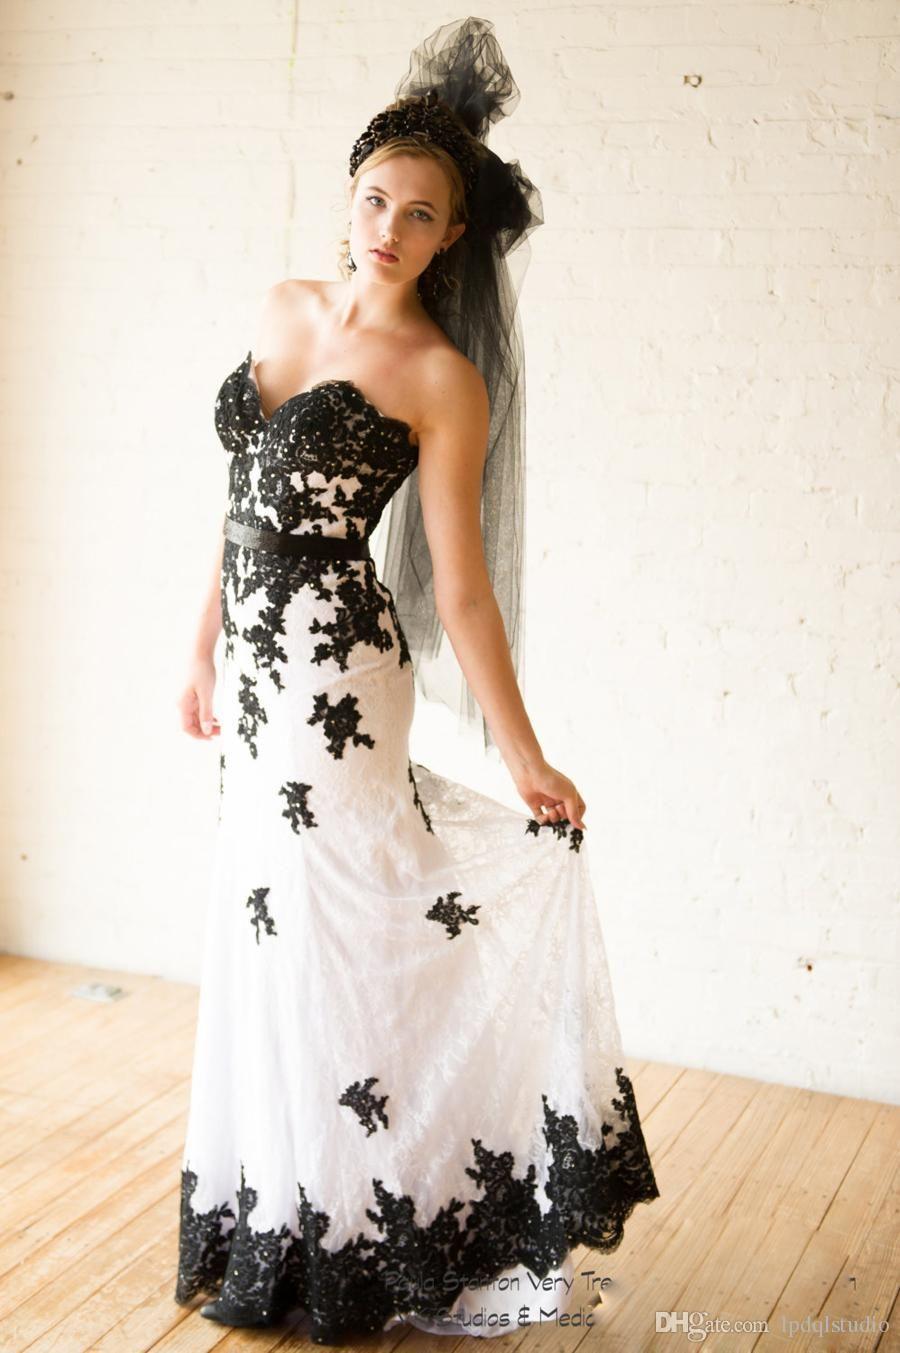 Stunning white and black wedding dress lace mermaid wedding dresses